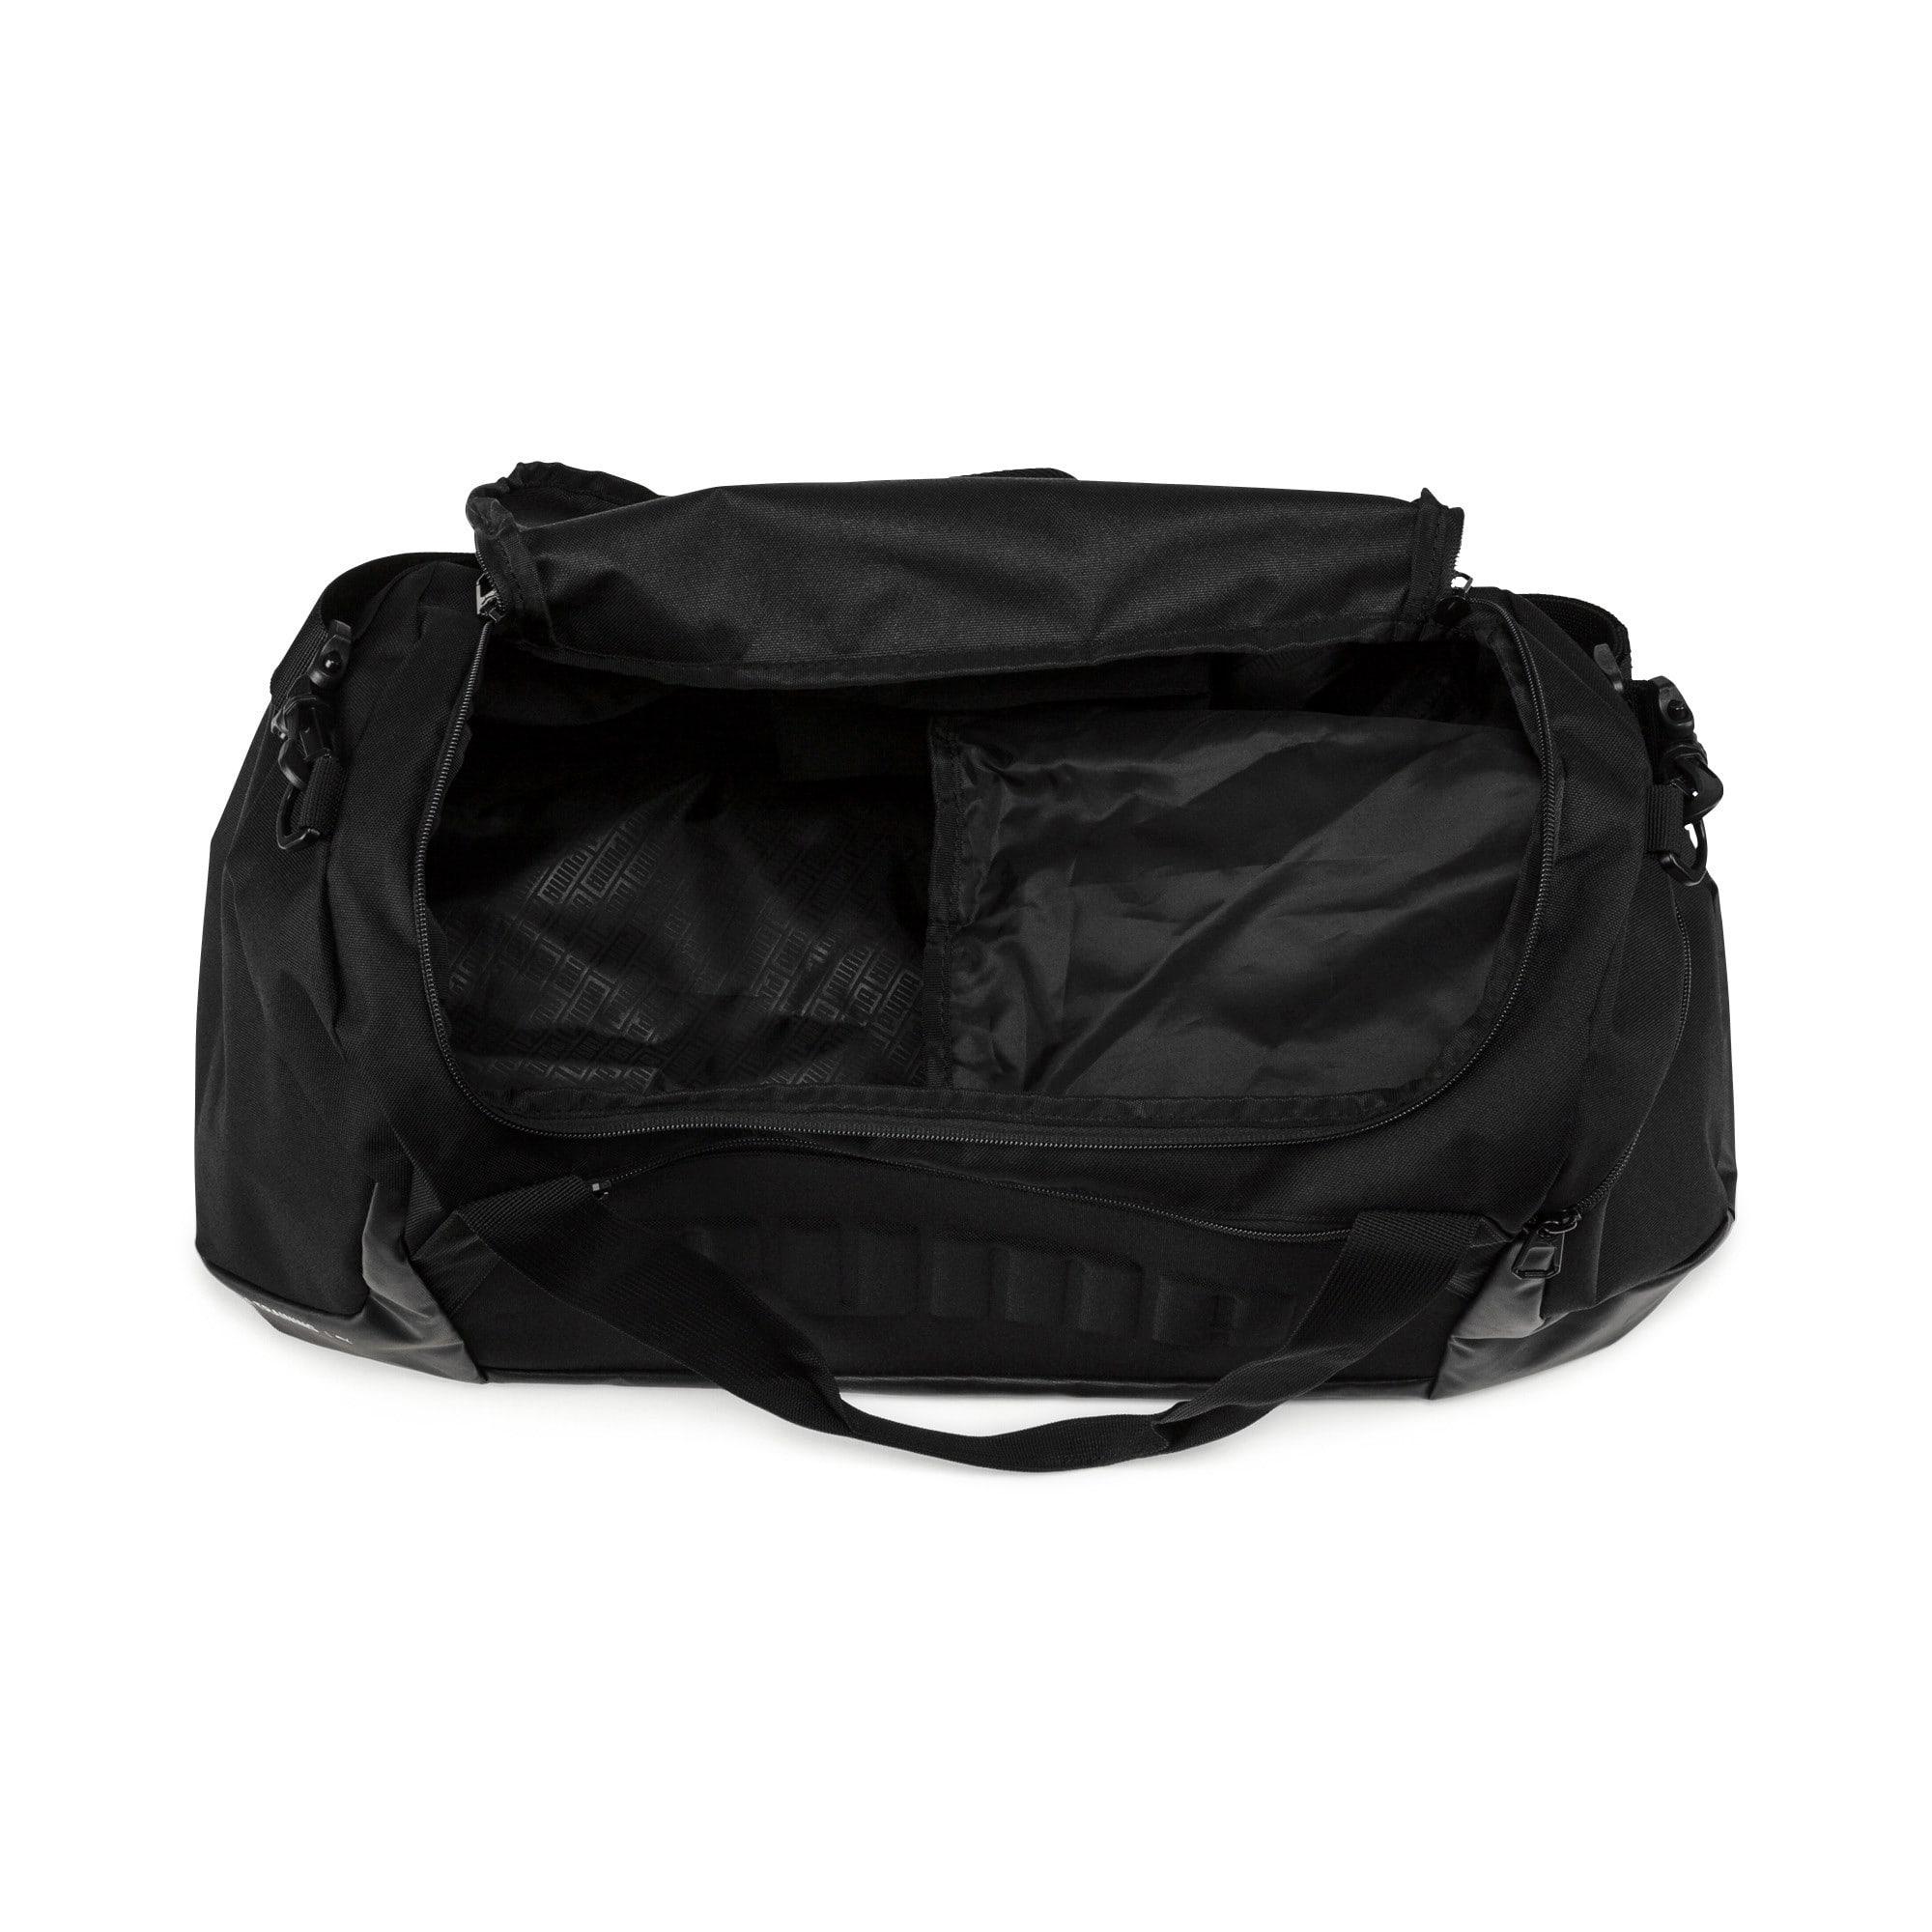 Thumbnail 4 of GYM Duffel Bag, Puma Black, medium